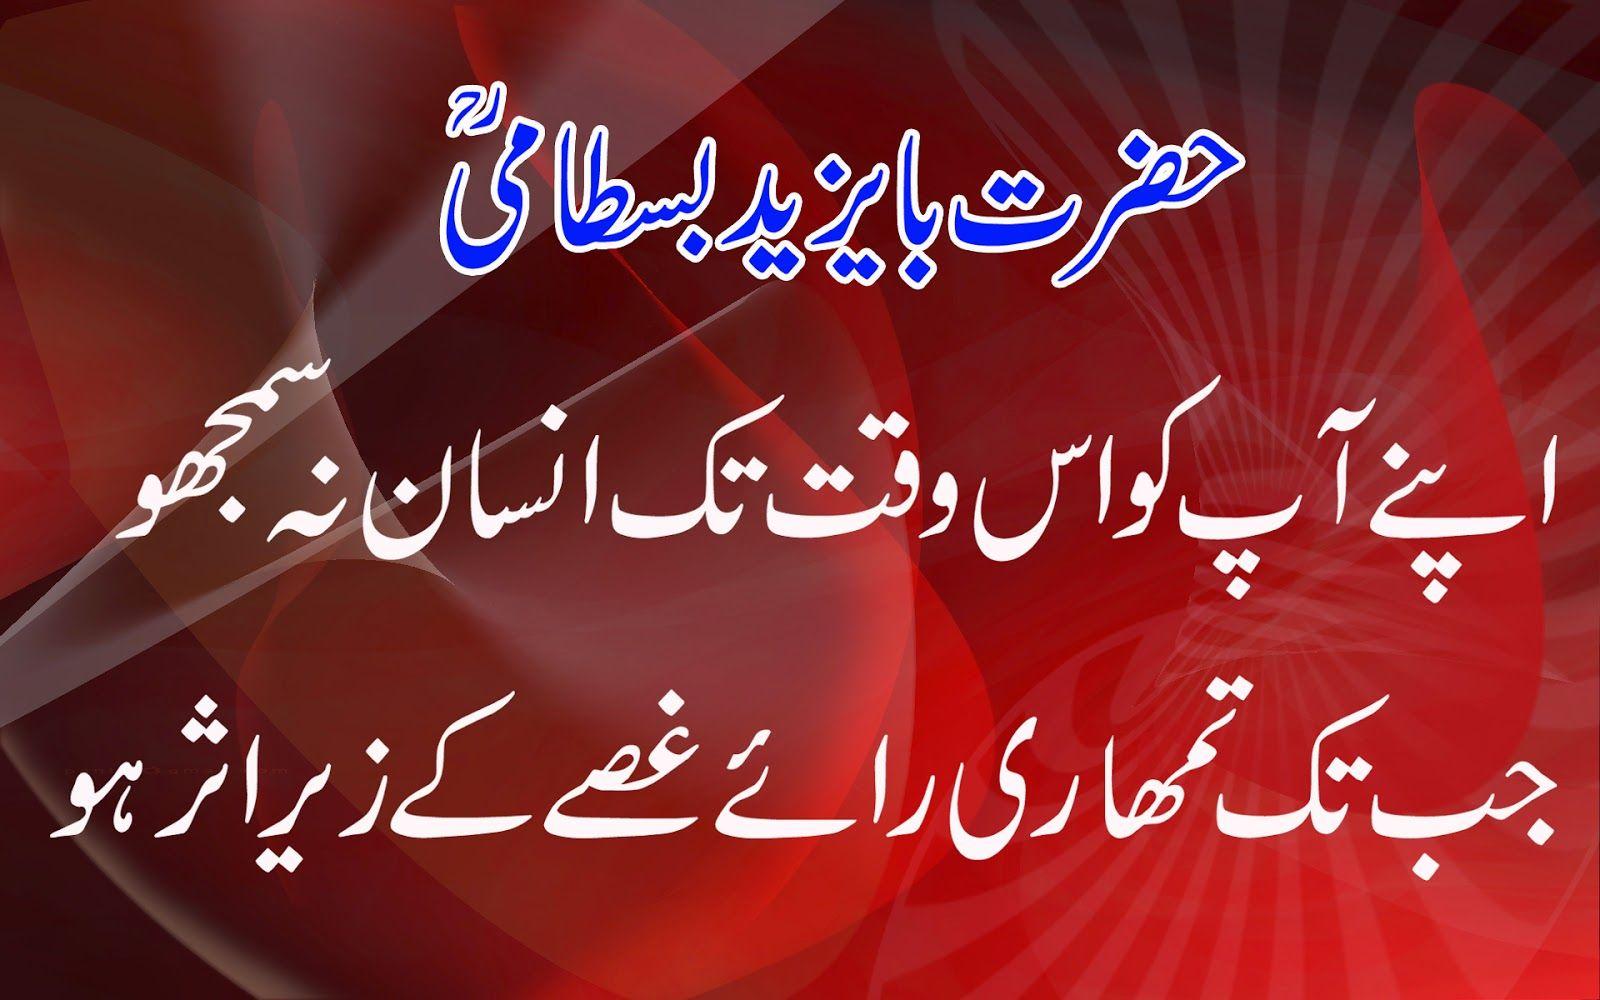 Hazrat Ba-Yazeed Bastami Aur Padri urdu book pdf download